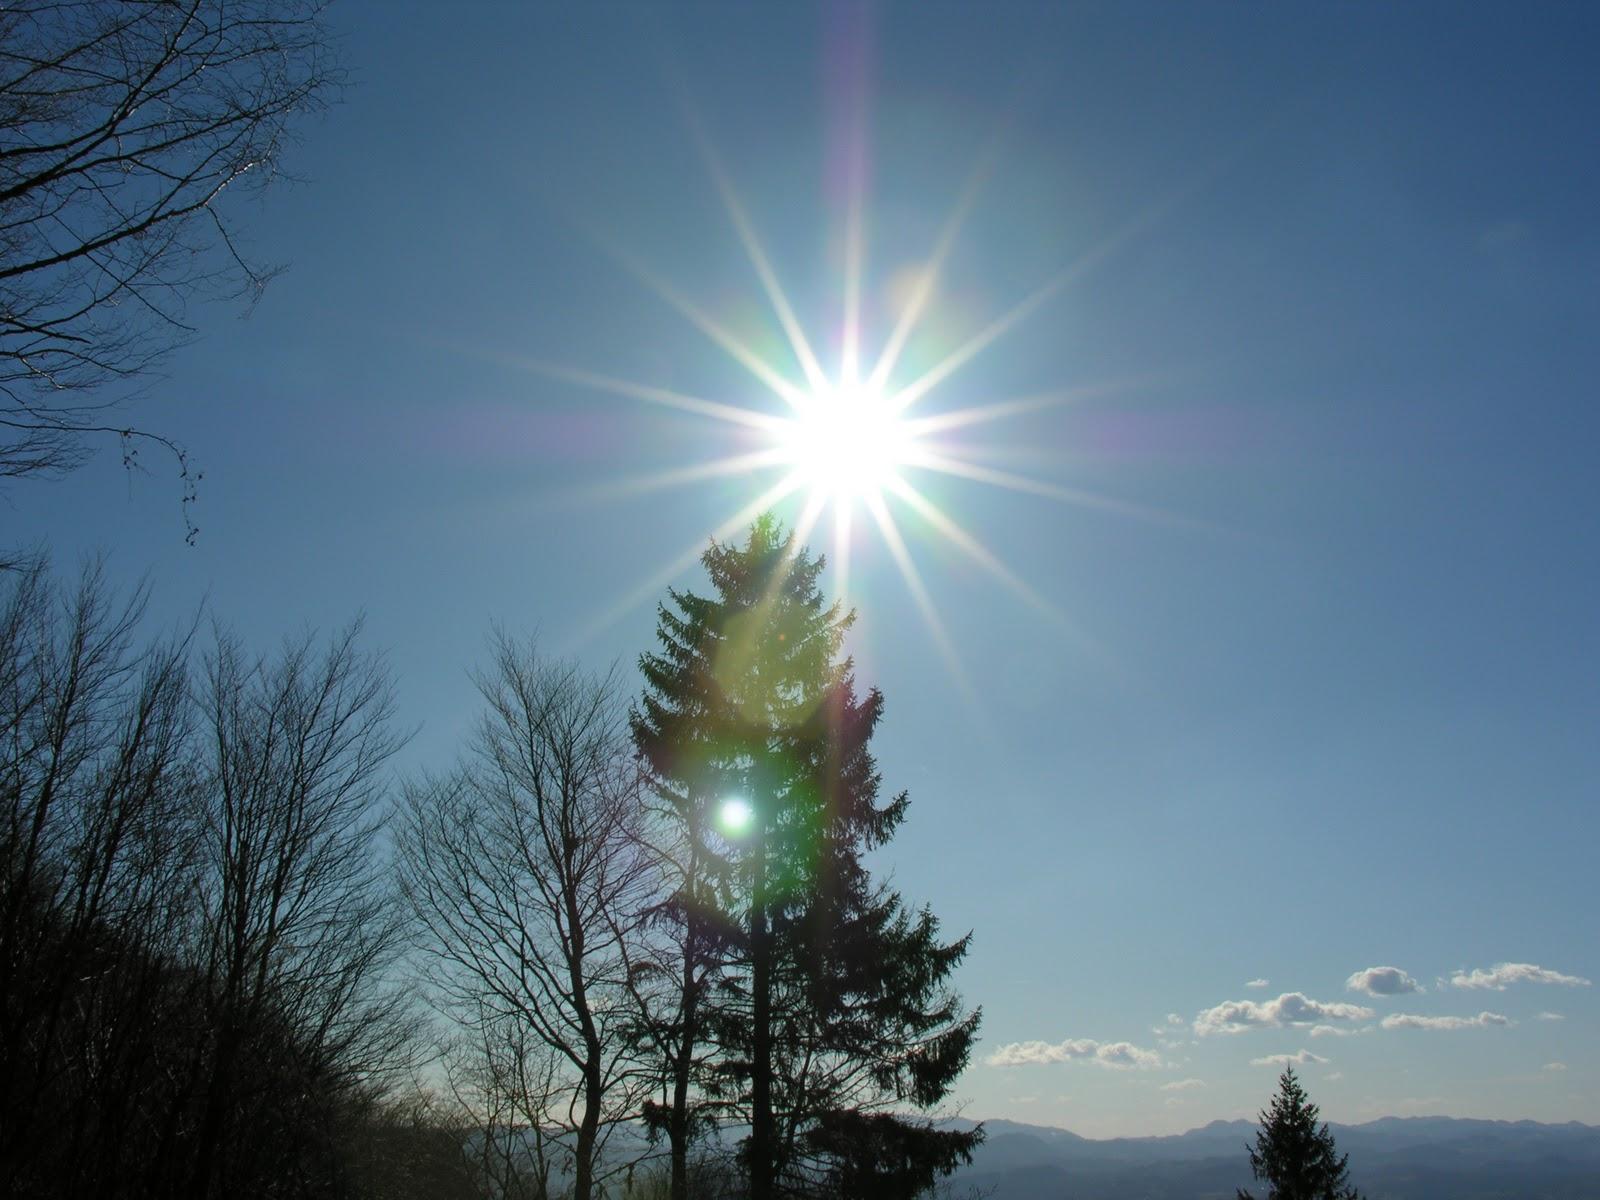 http://1.bp.blogspot.com/-xCRhyduNXA8/TtQELcGVL6I/AAAAAAAAAG8/7fmzdFQeuyg/s1600/larasatisayang.blogspot.com-sunny-sky-free-best-wallpaper.jpg